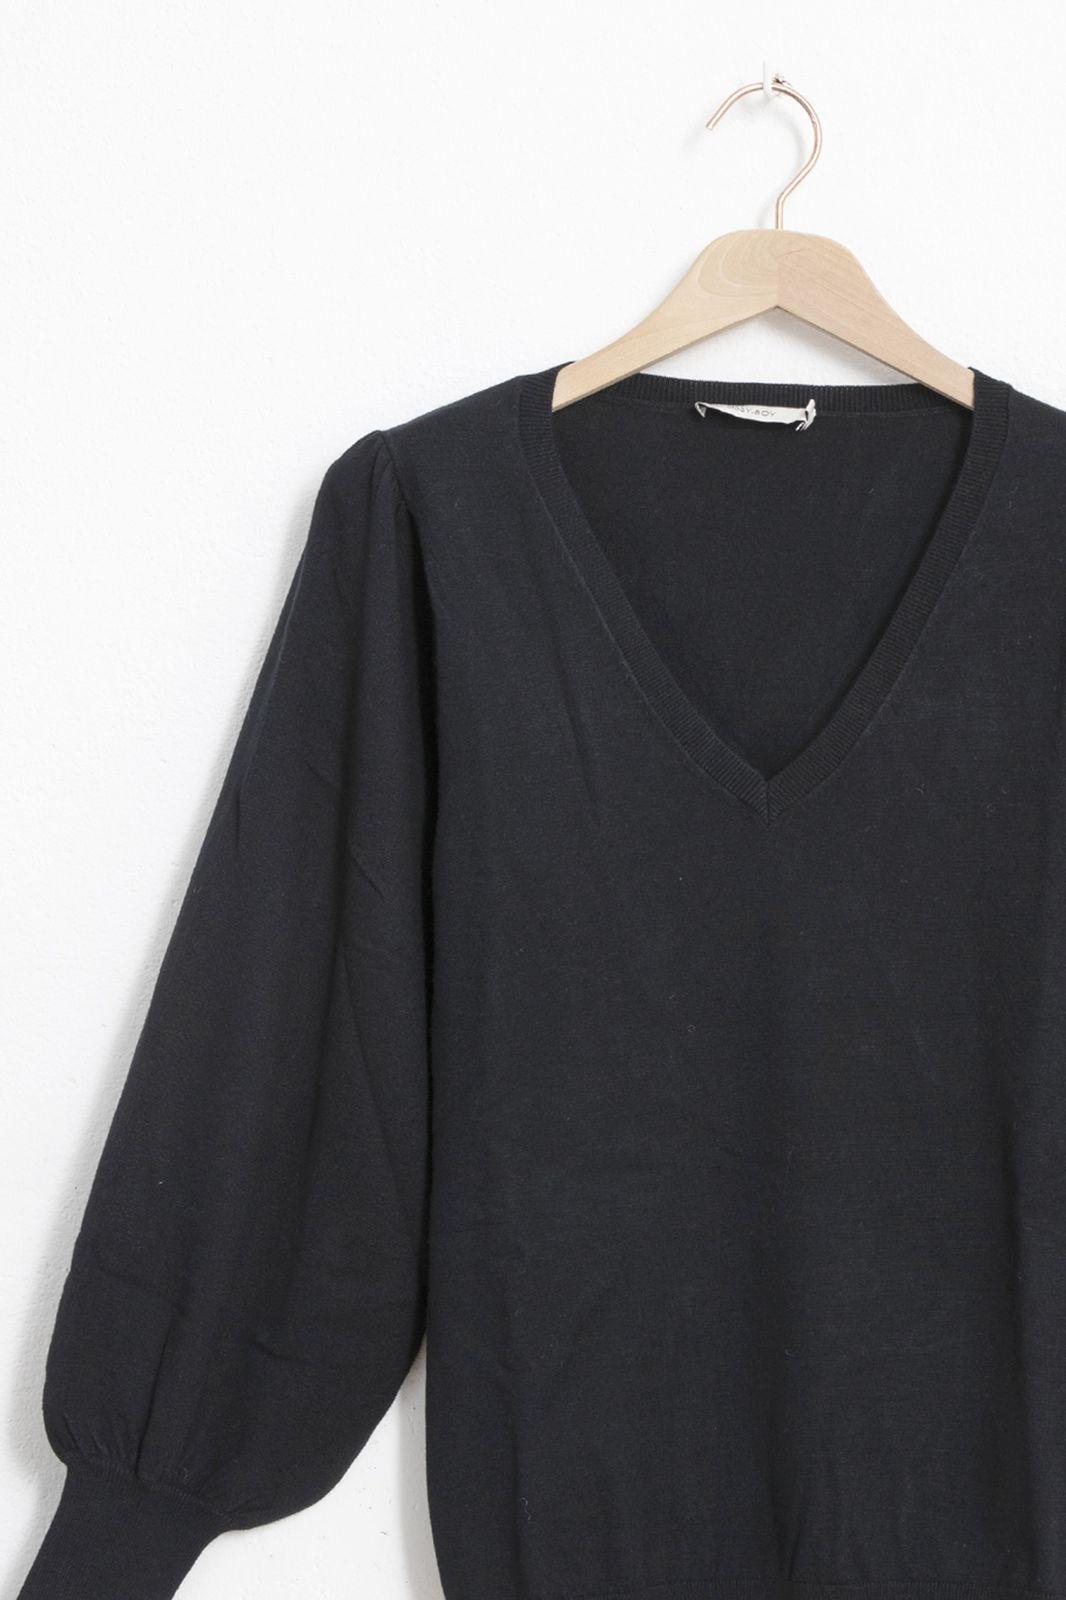 Zwarte pullover met v-hals en pofmouwen - Dames | Sissy-Boy